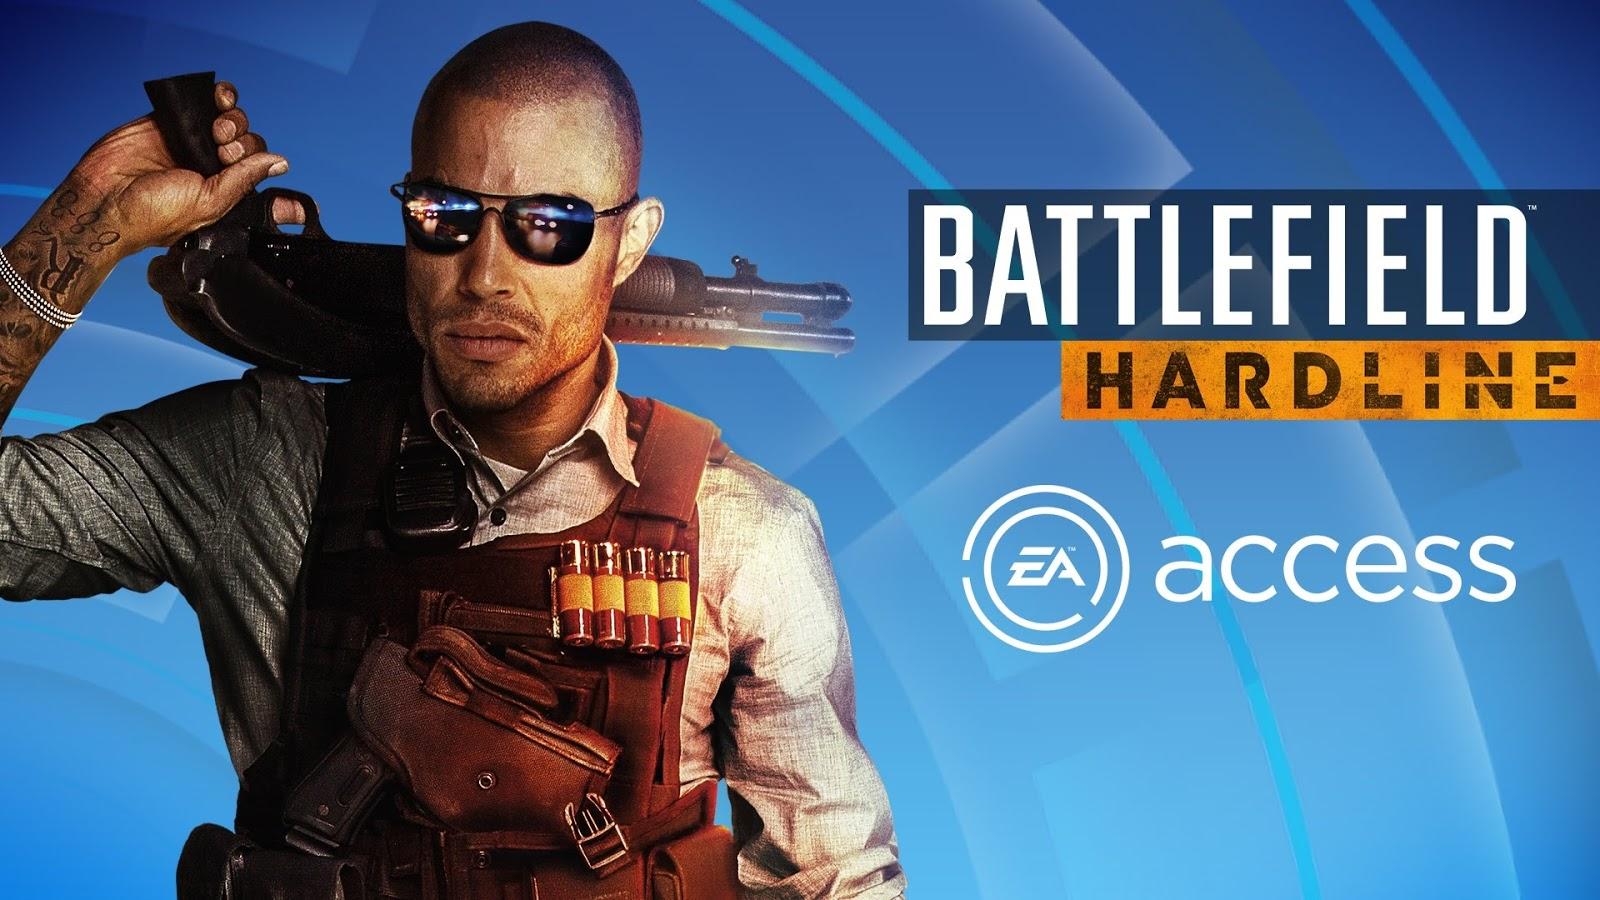 Battlefield Hardline está gratuito para jogadores do Xbox One assinantes do EA Access